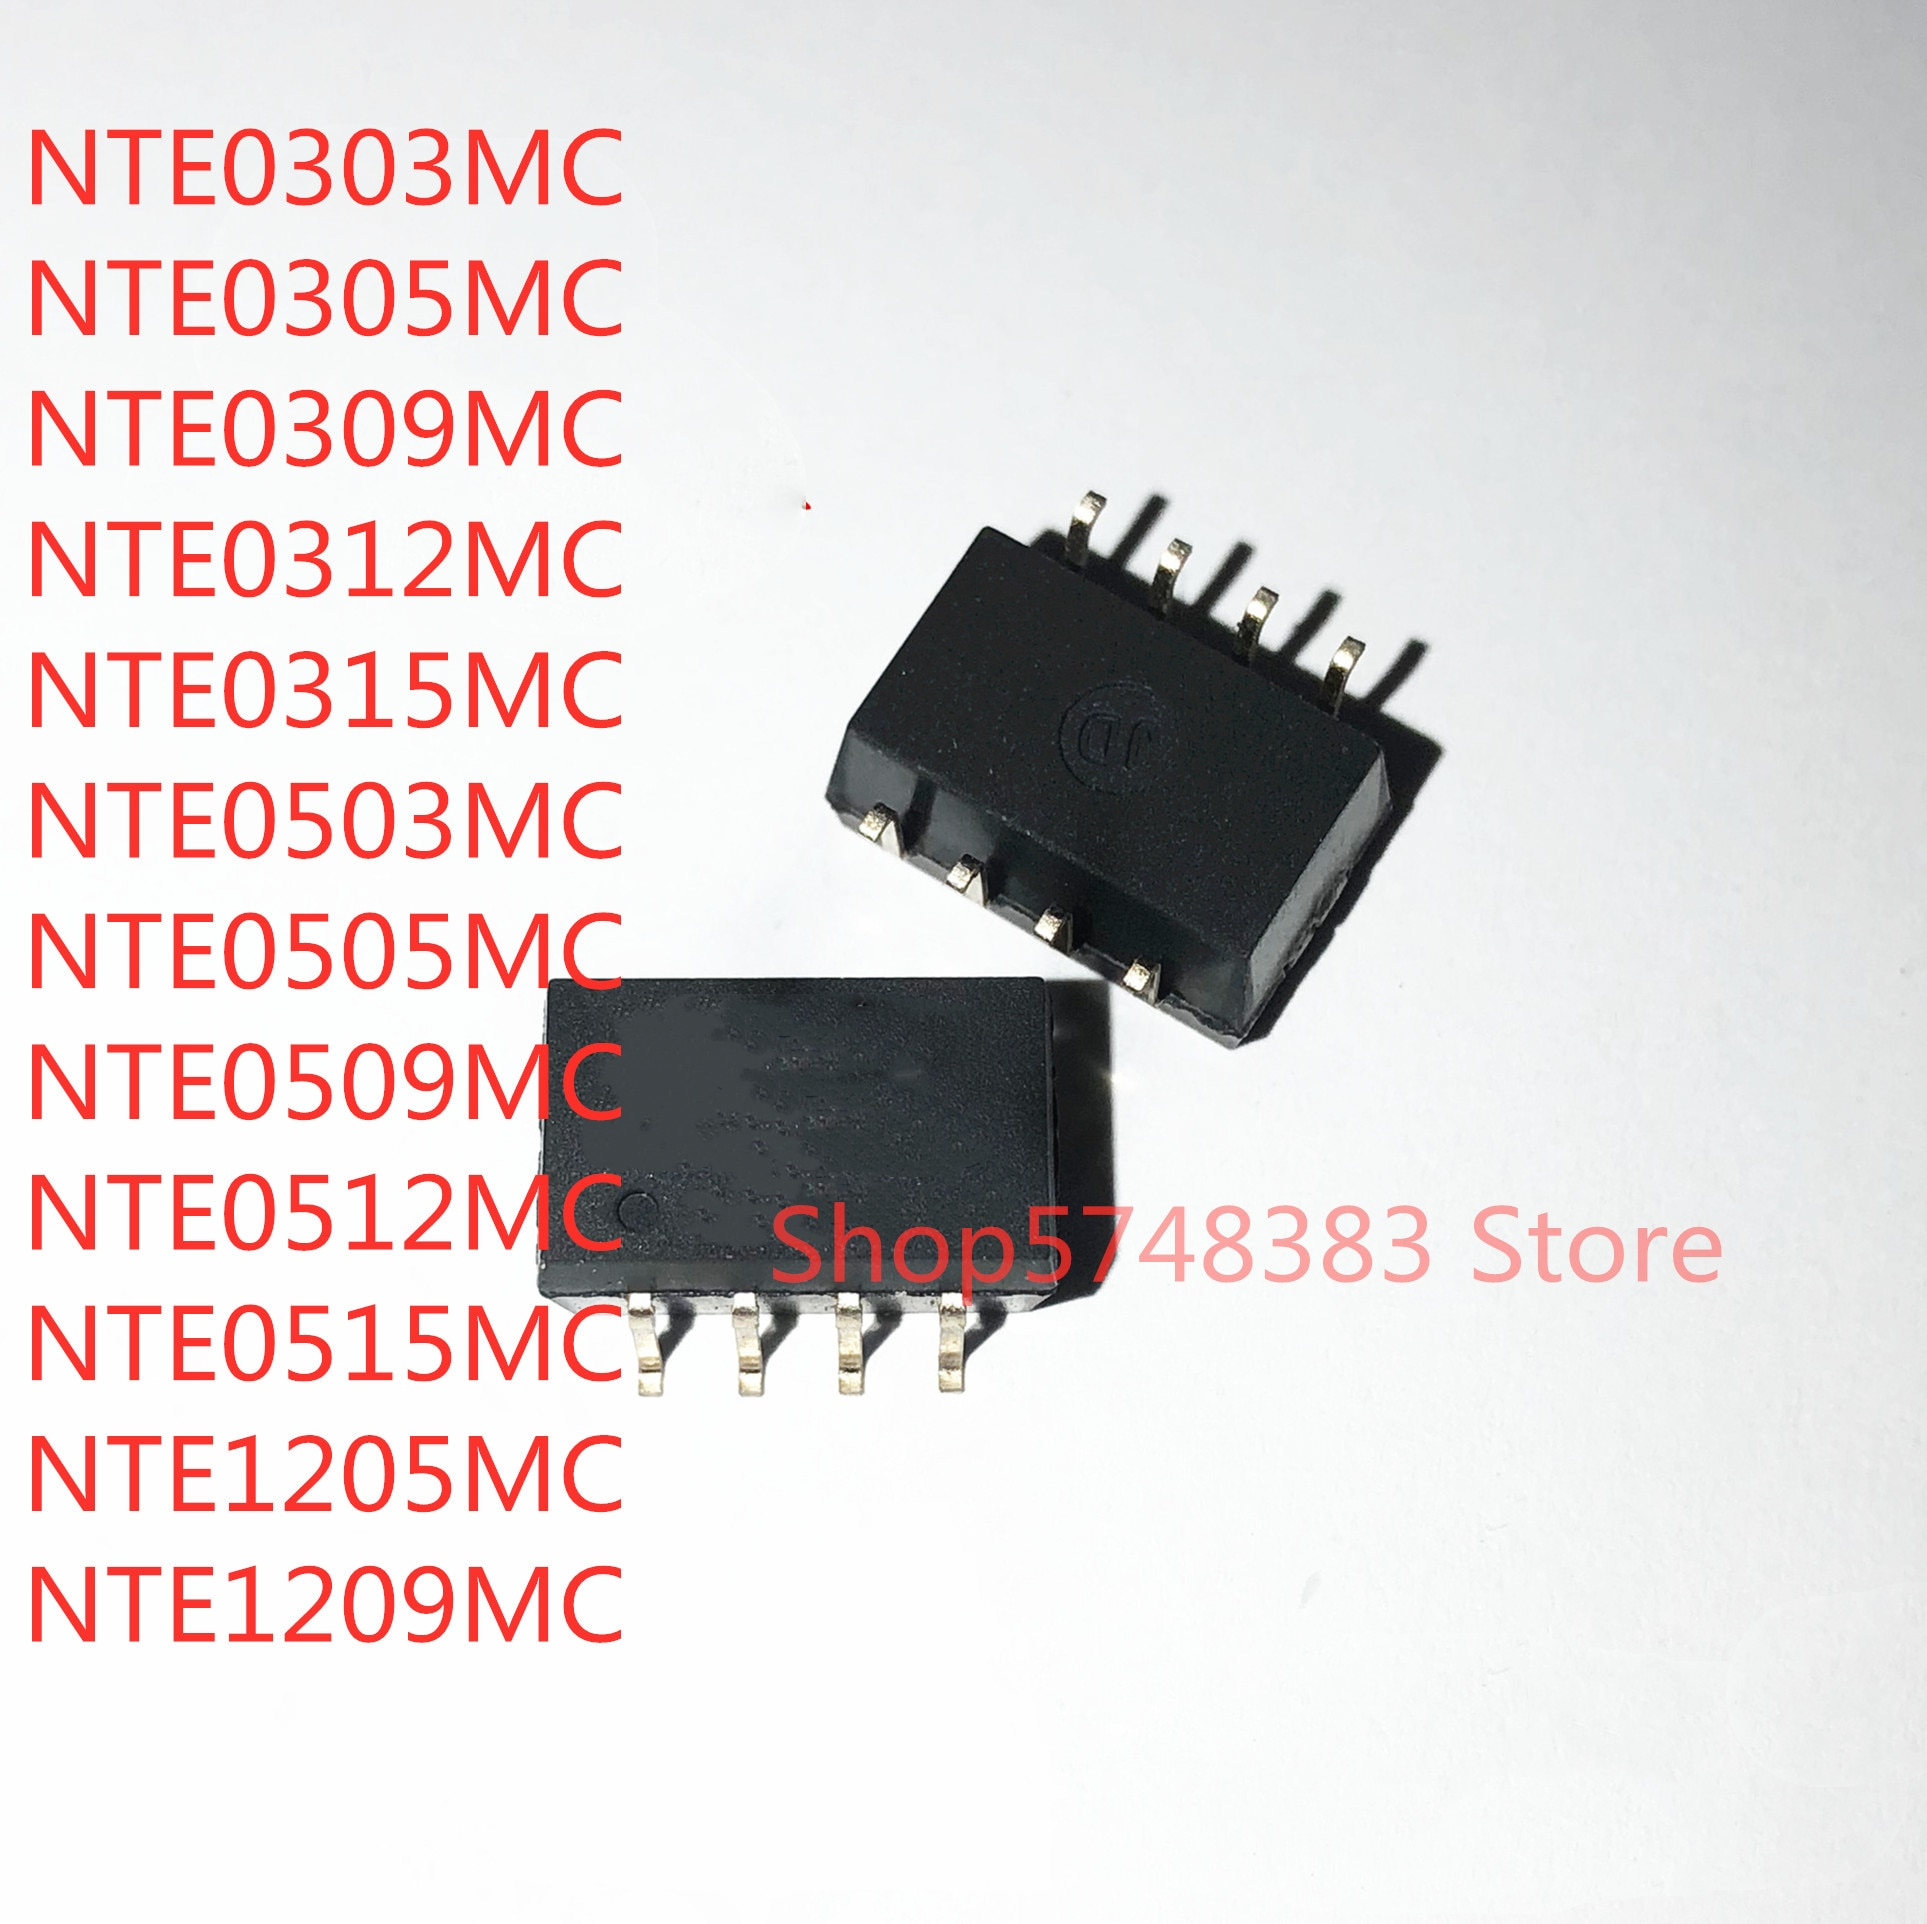 10 قطعة NTE0303MC NTE0305MC NTE0309MC NTE0312MC NTE0315MC NTE0503MC NTE0505MC NTE0509MC NTE0512MC NTE0515MC NTE1205MC NTE1209MC